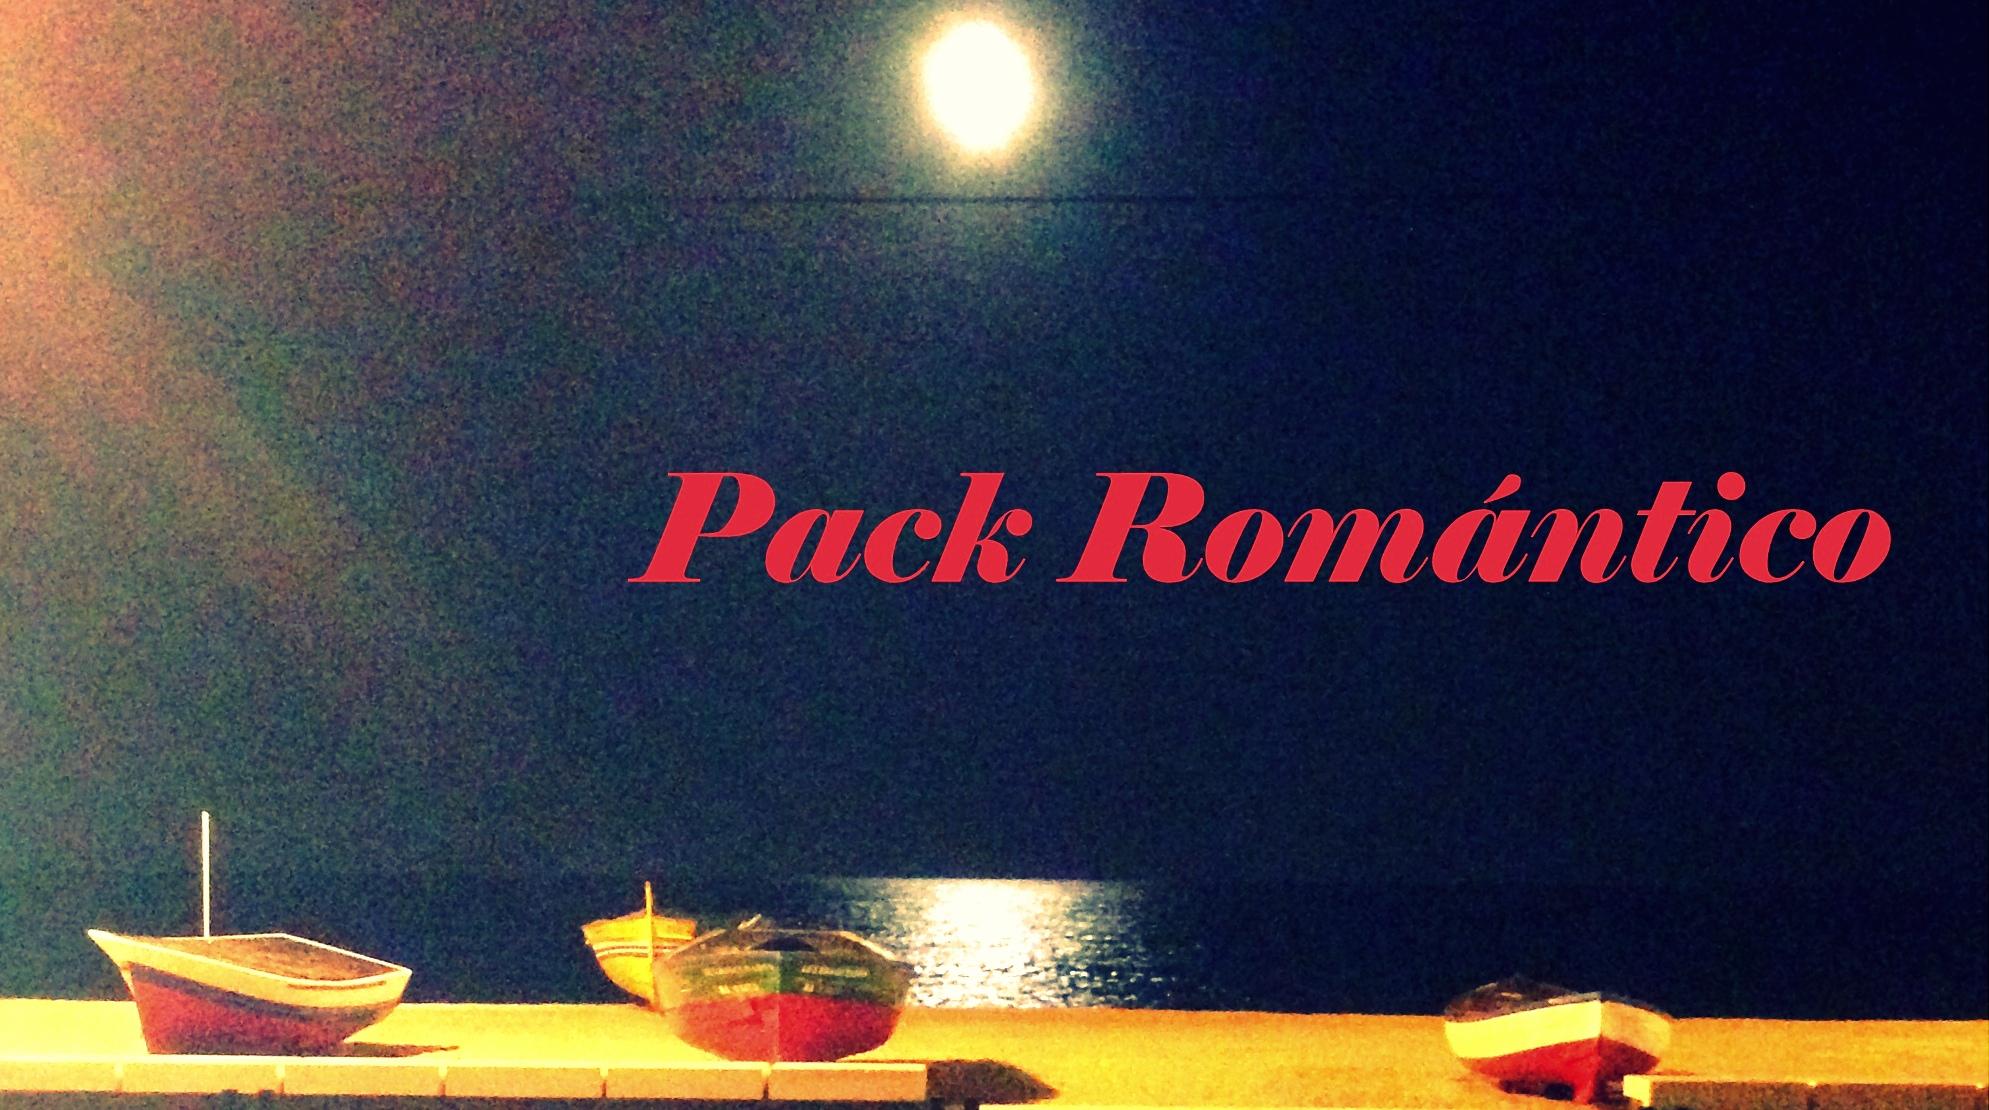 pac romantico_2